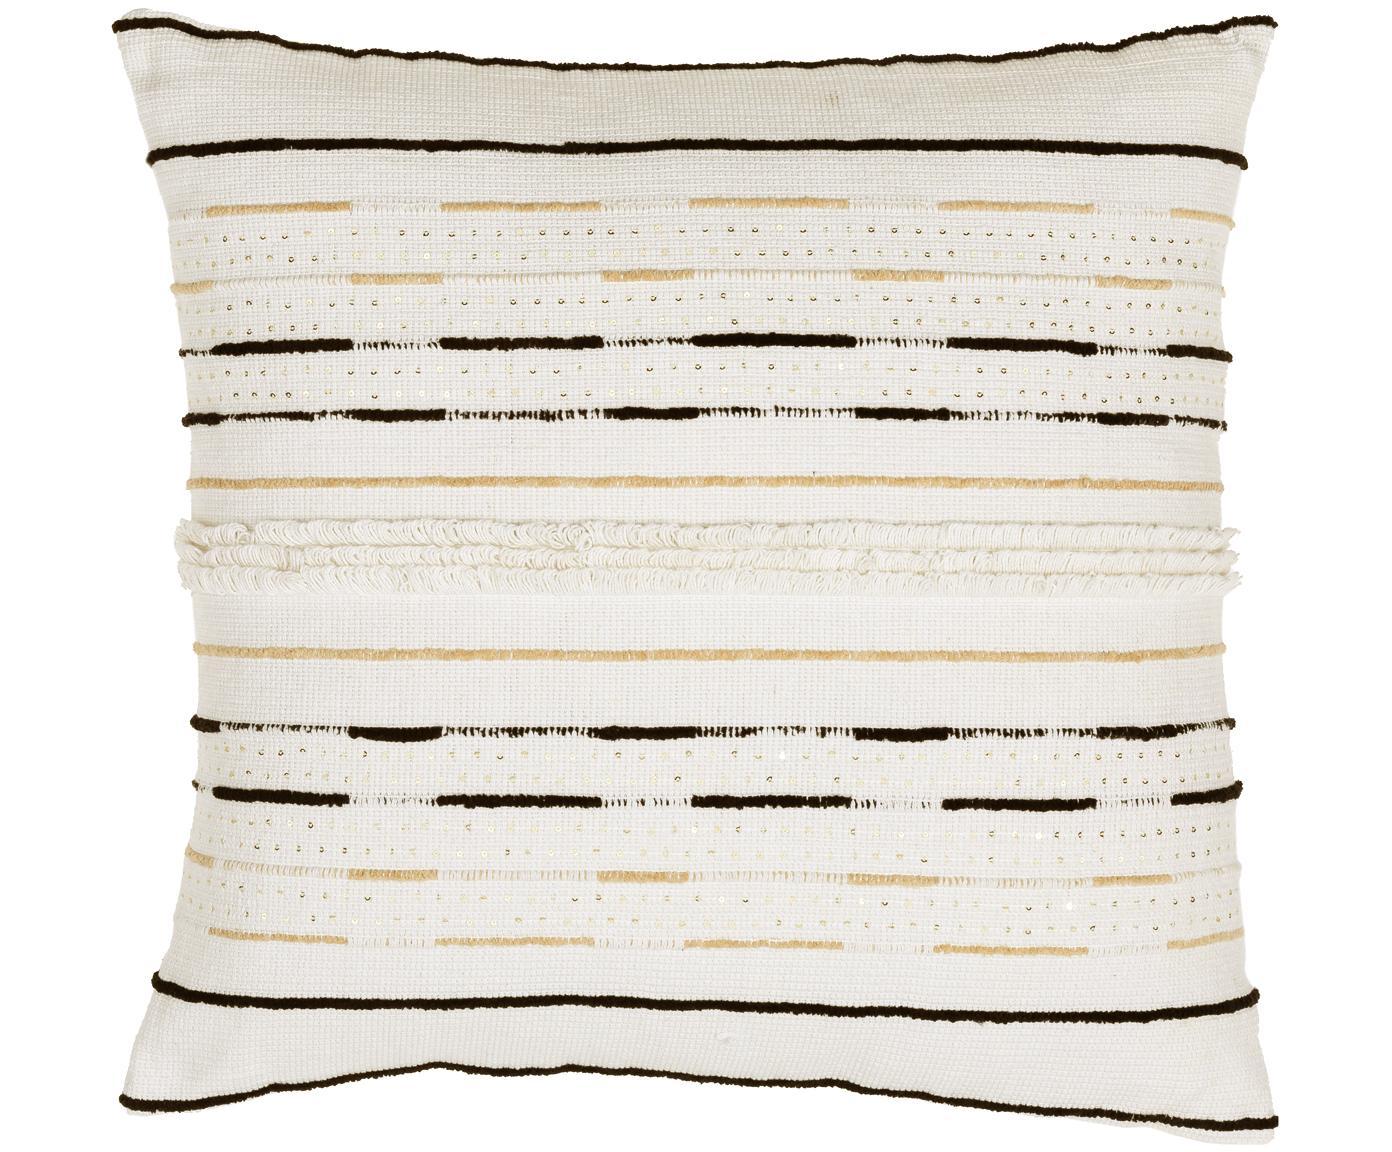 Cojín con lentejuelas Lena, con relleno, Funda: algodón Relleno poliéster, Blanco, negro, beige claro, An 60 x L 60 cm